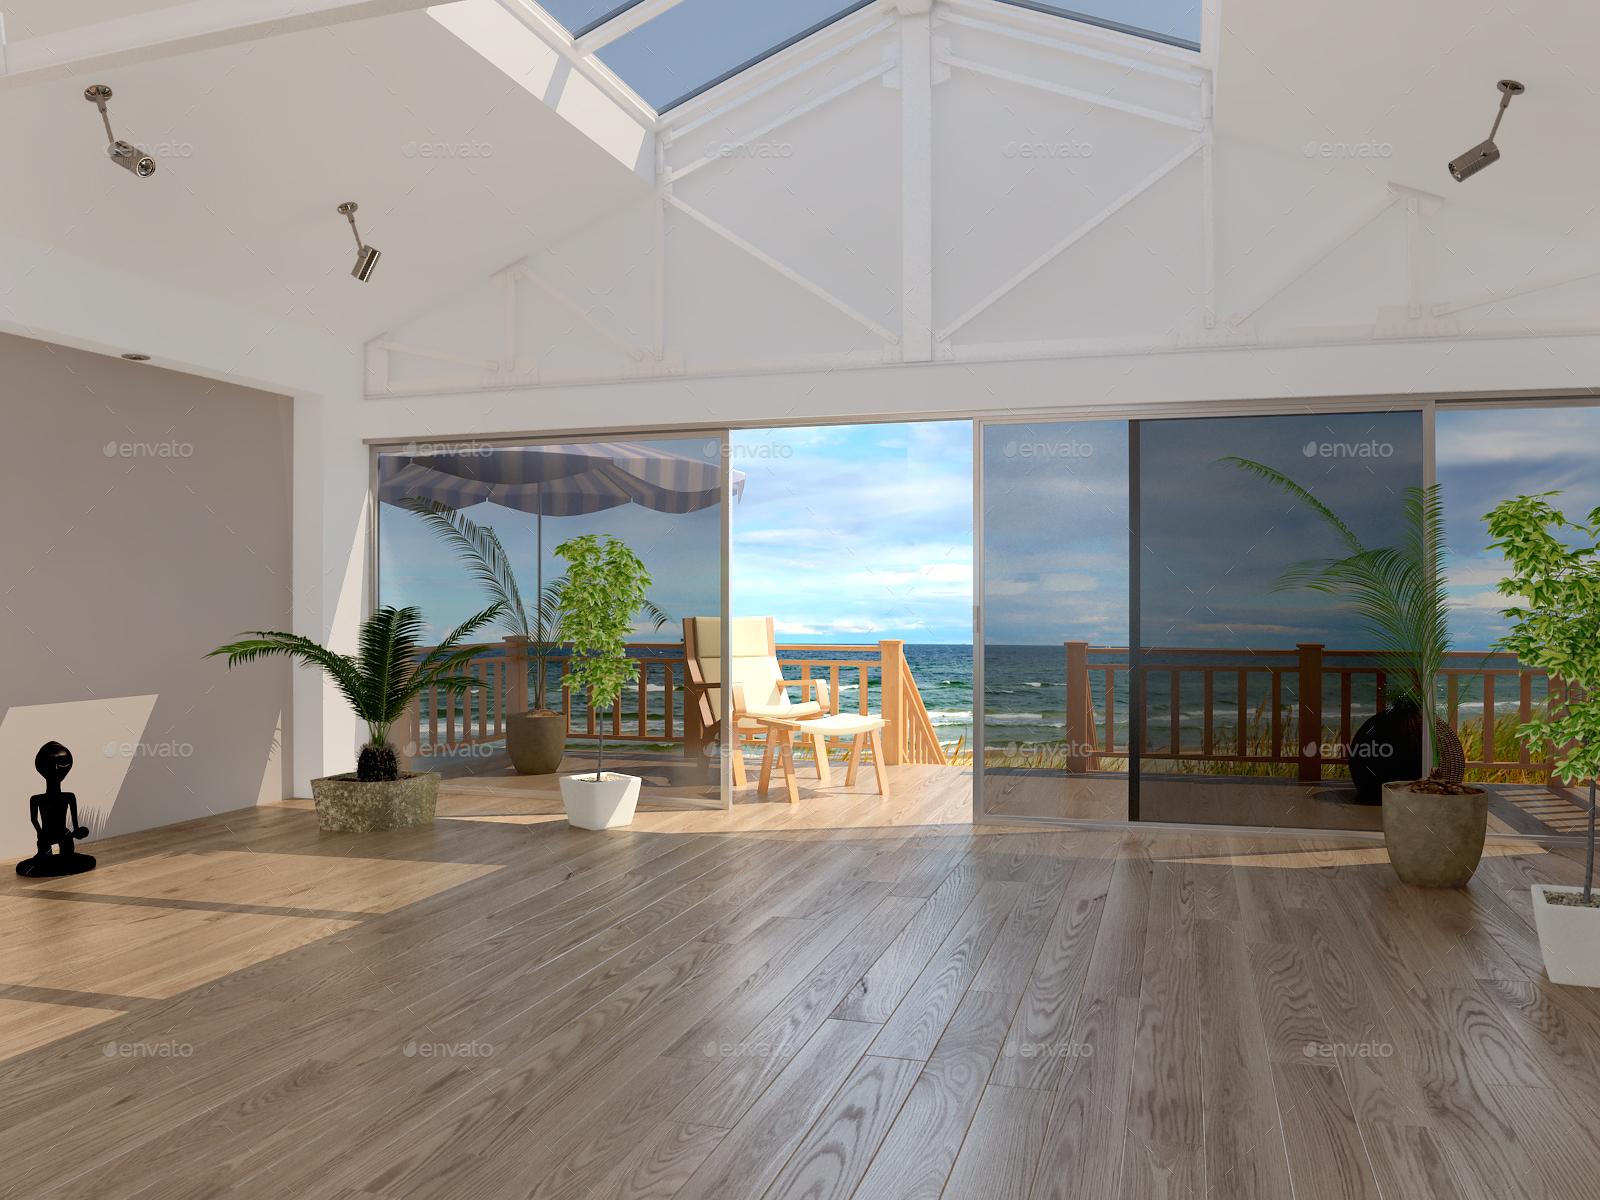 33 Lauzon Oak Natural - Flooring